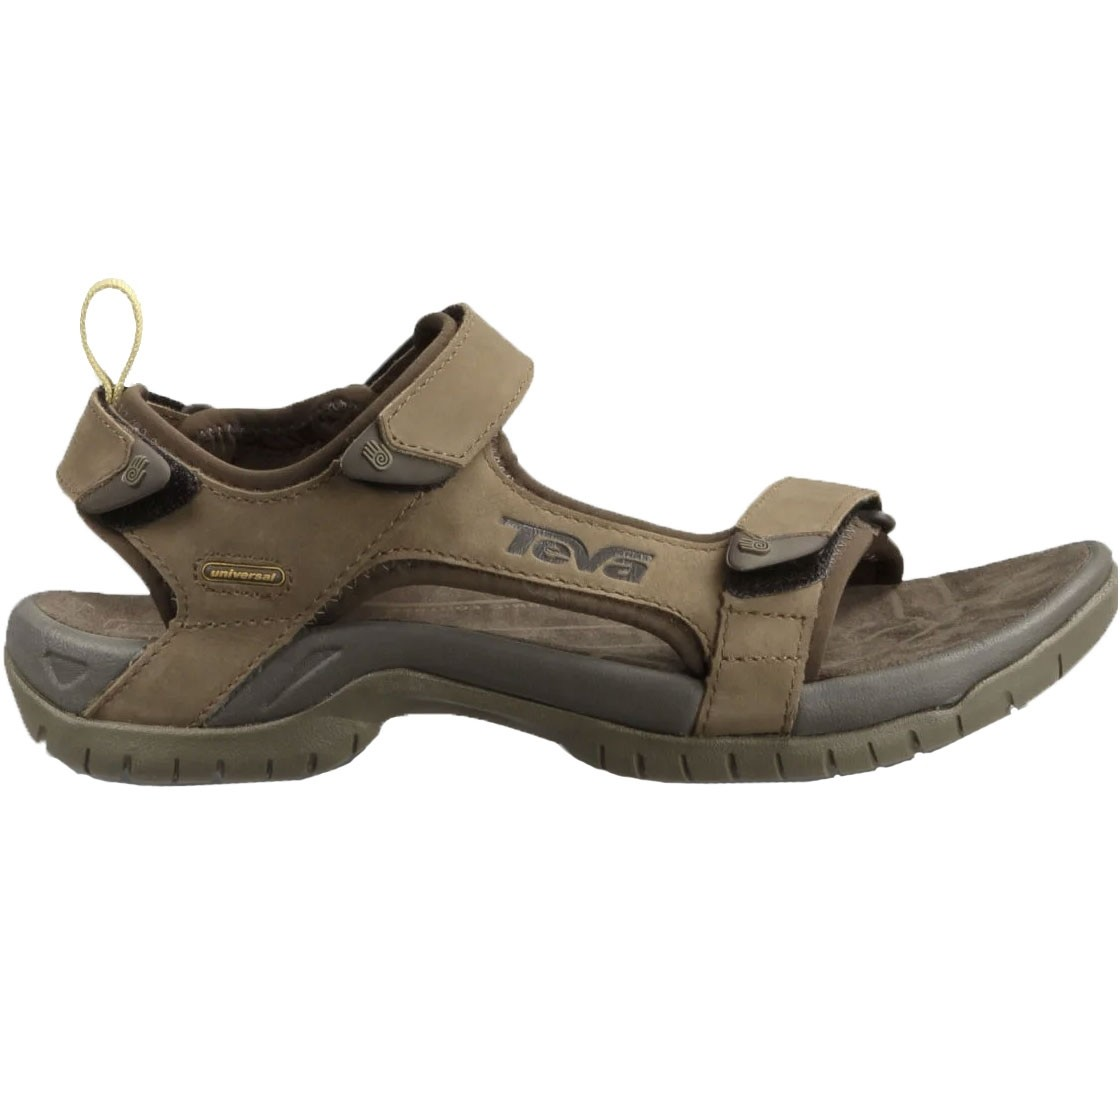 Teva Tanza Leather Men's Sandal - Brown